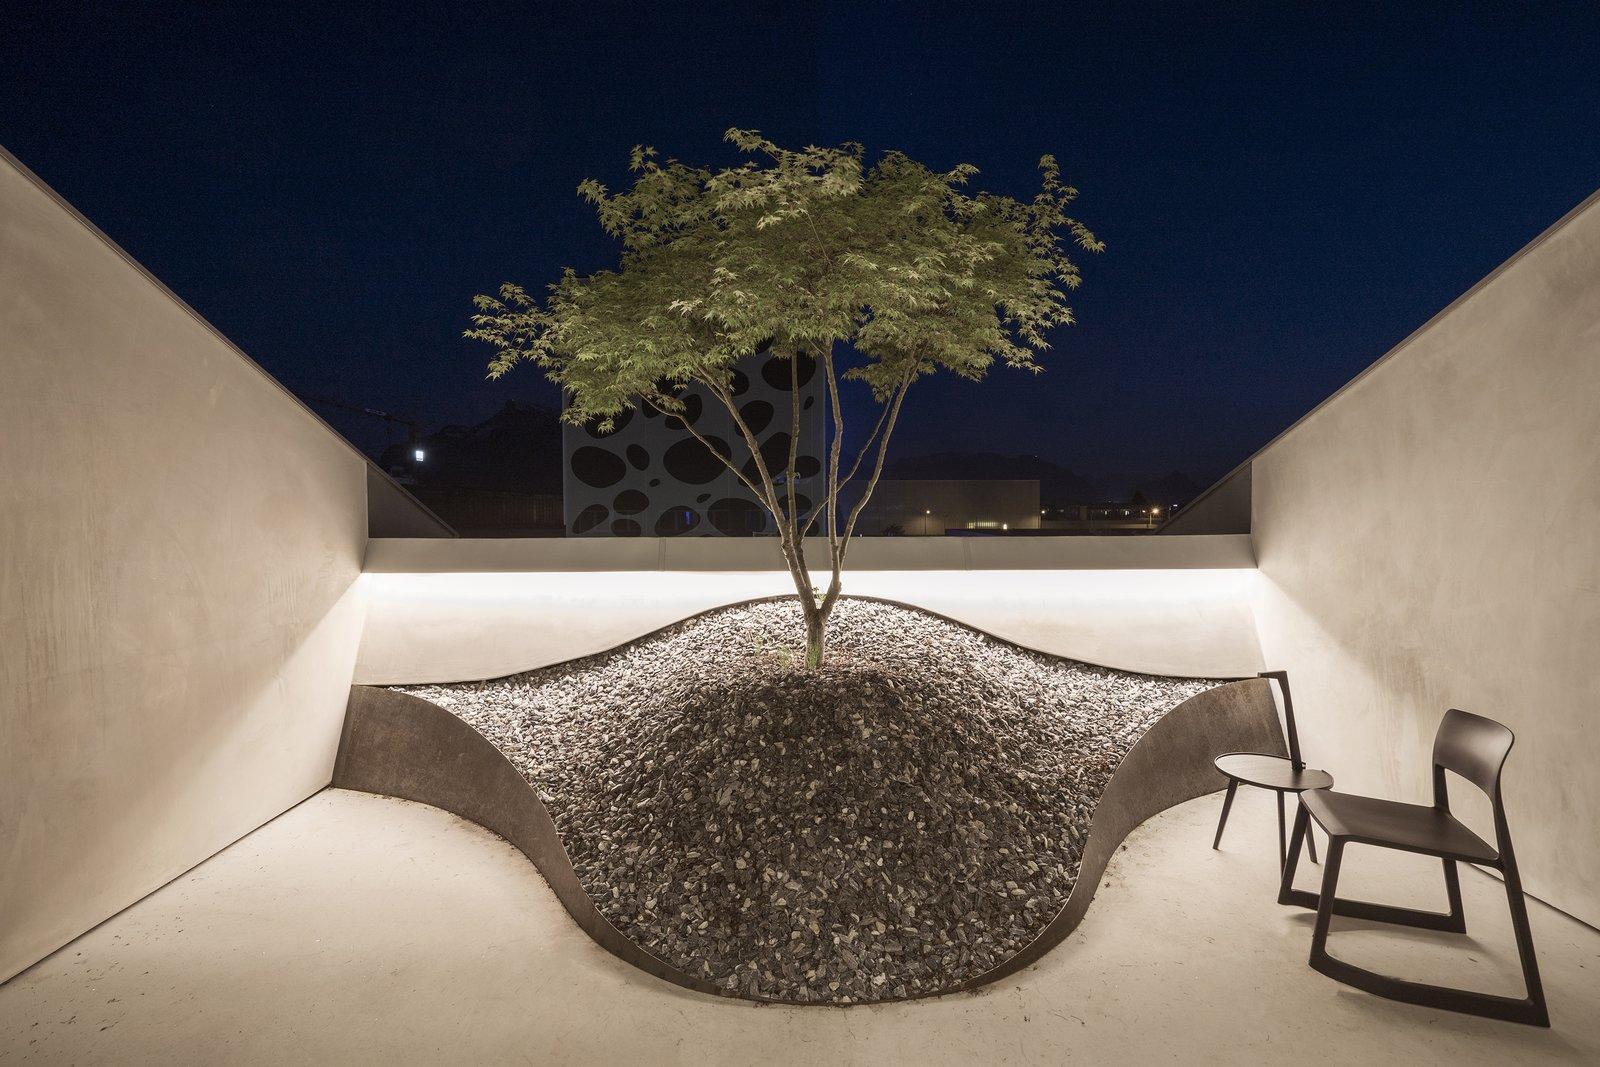 Loft Panzerhalle balcony with rock garden